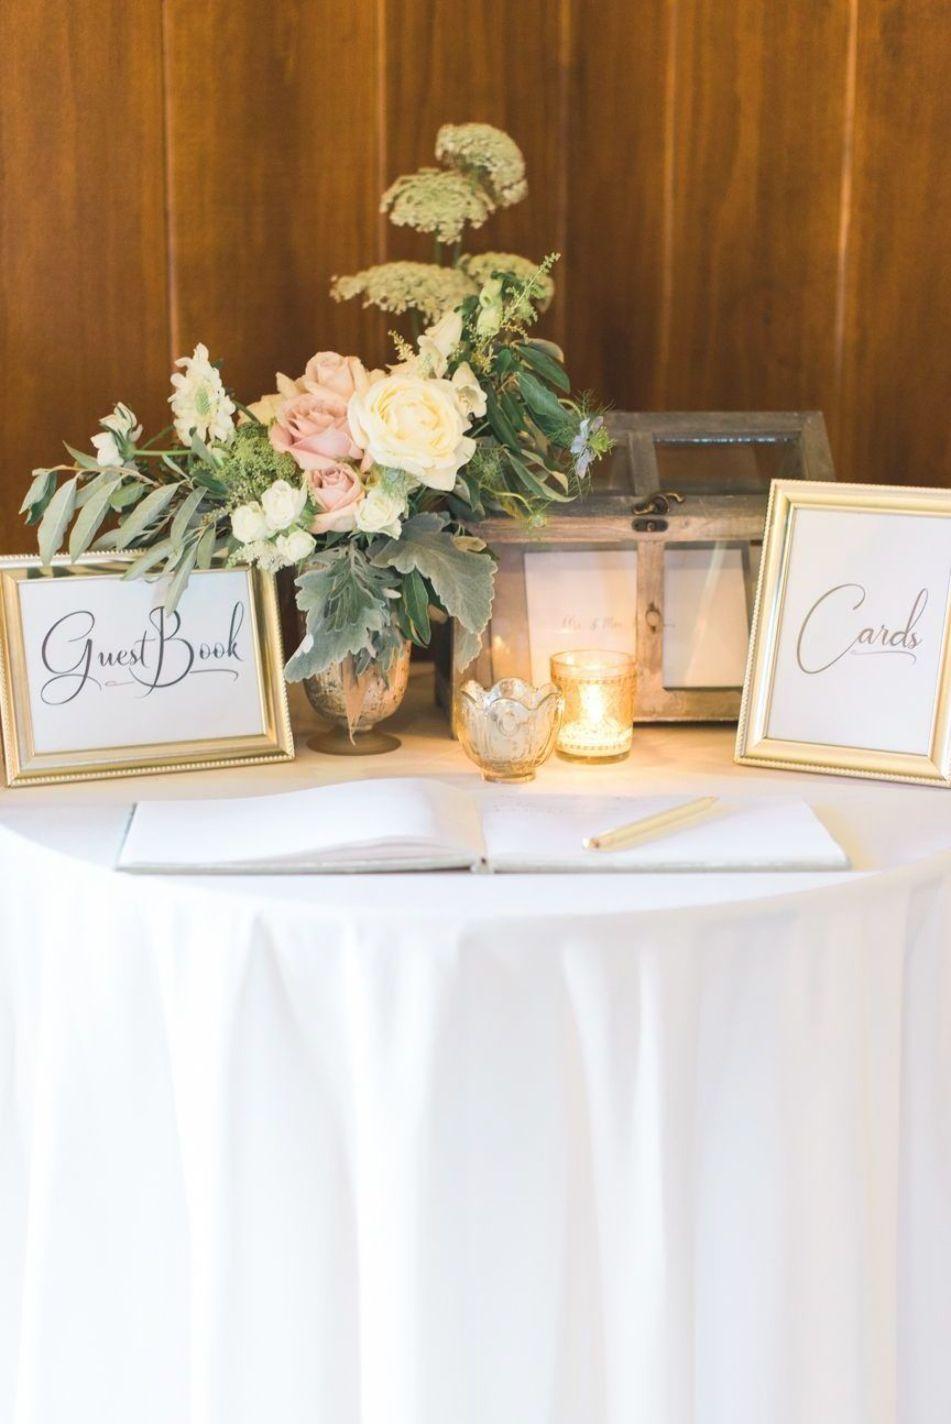 Guest Book Cards Table Pernikahan Inspirasi Romantis